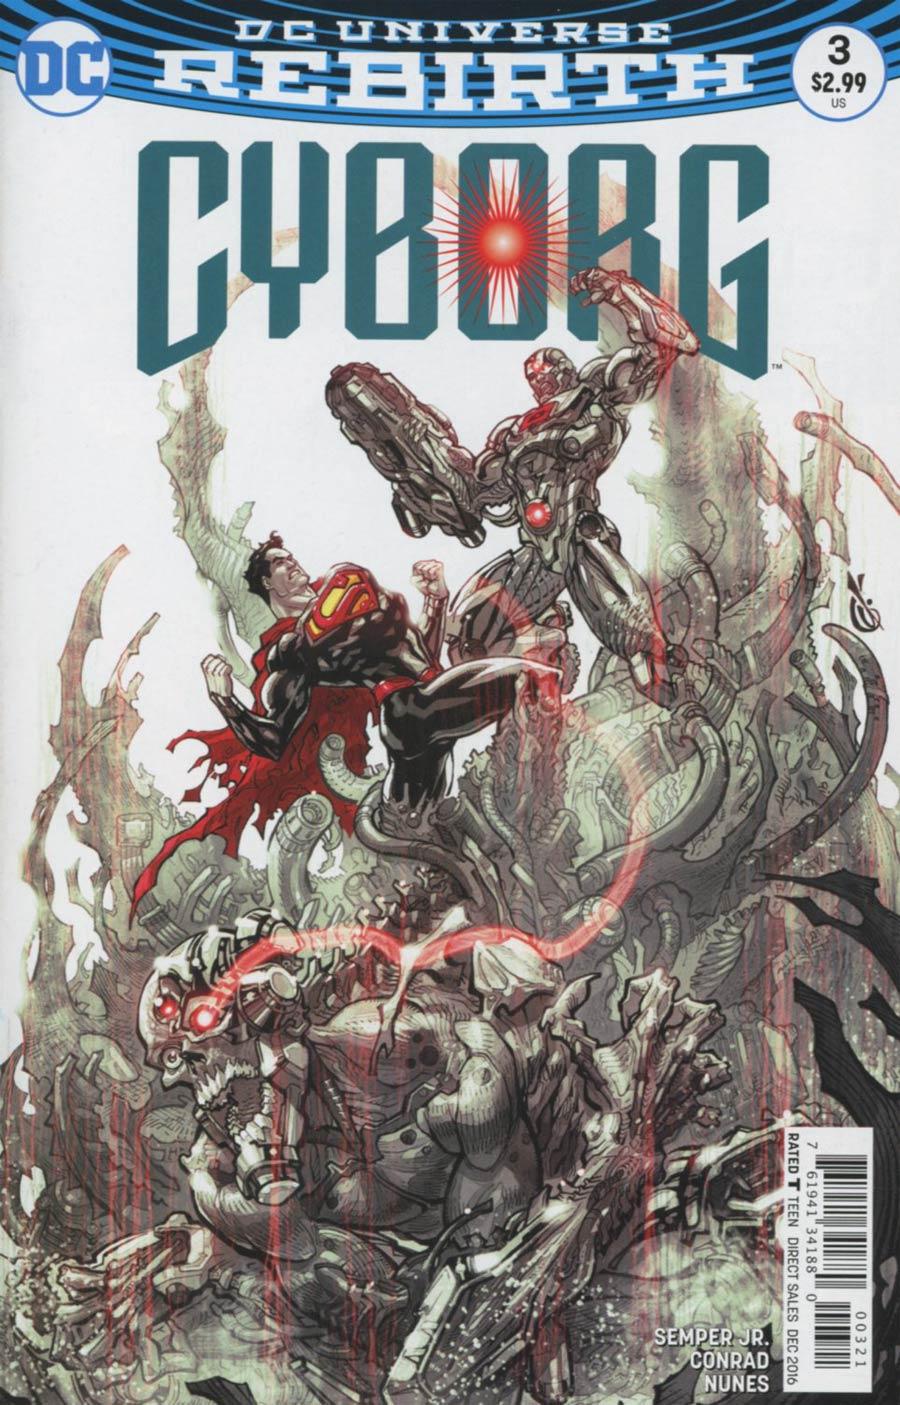 Cyborg Vol 2 #3 Cover B Variant Carlos DAnda Cover